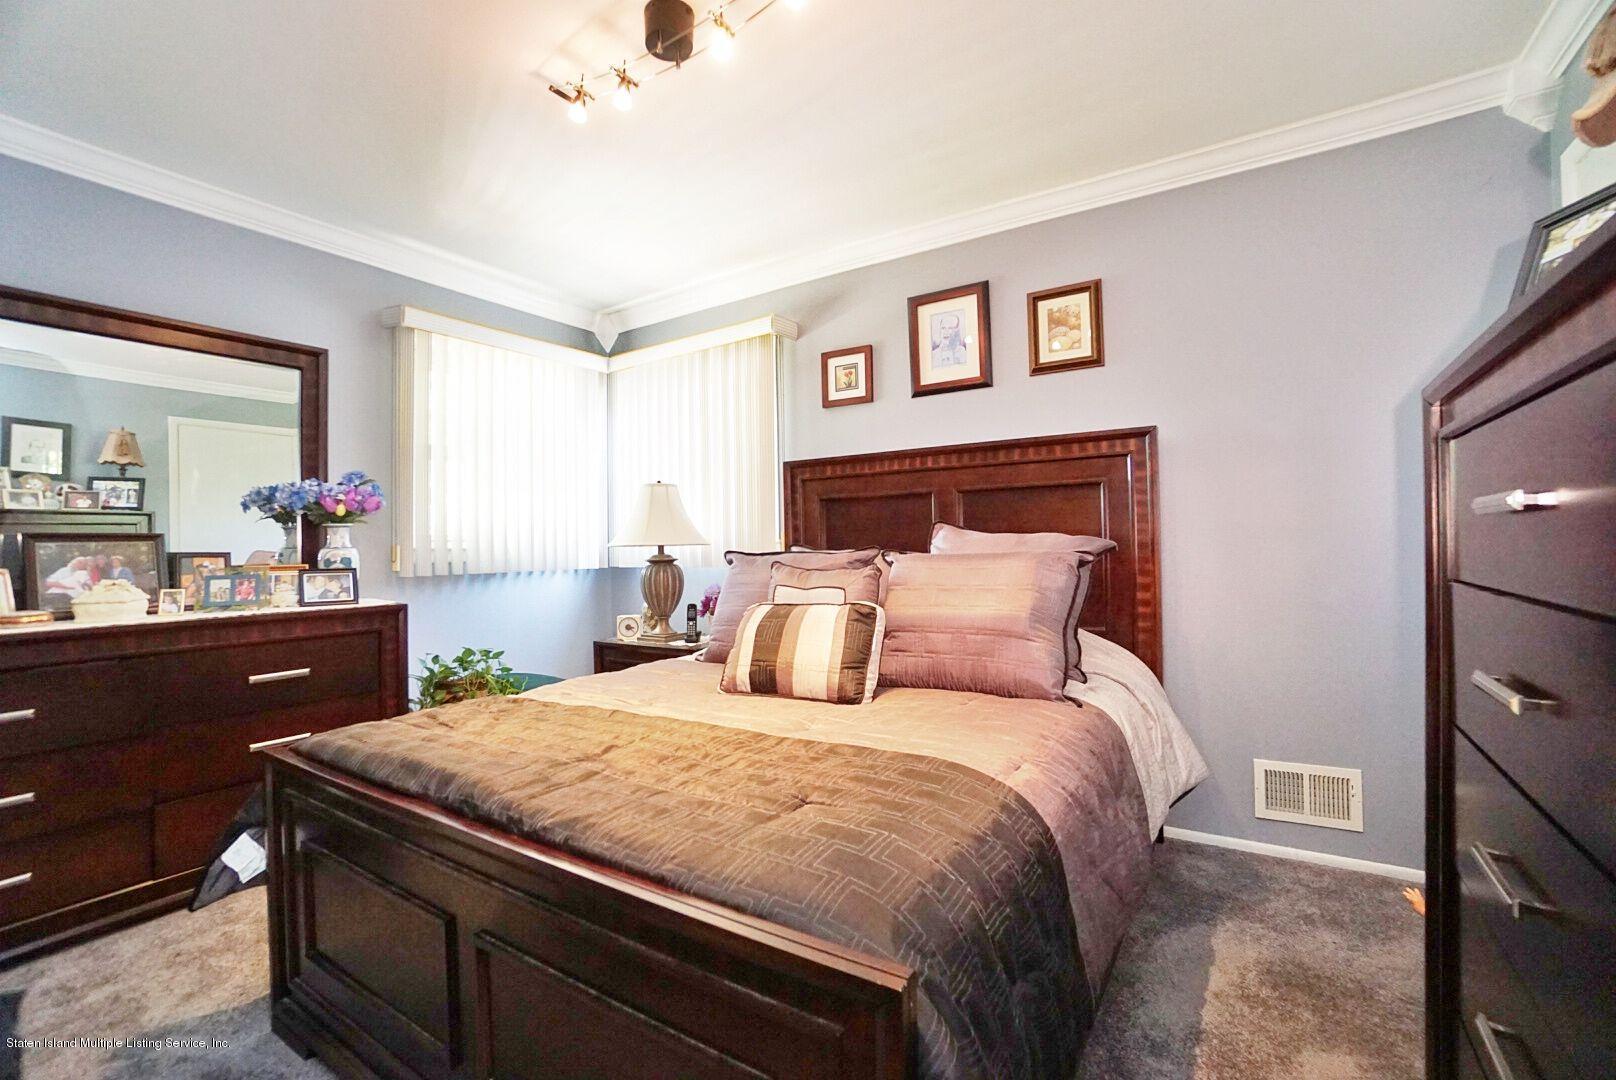 Single Family - Detached 283 Holdridge Avenue  Staten Island, NY 10312, MLS-1130000-16